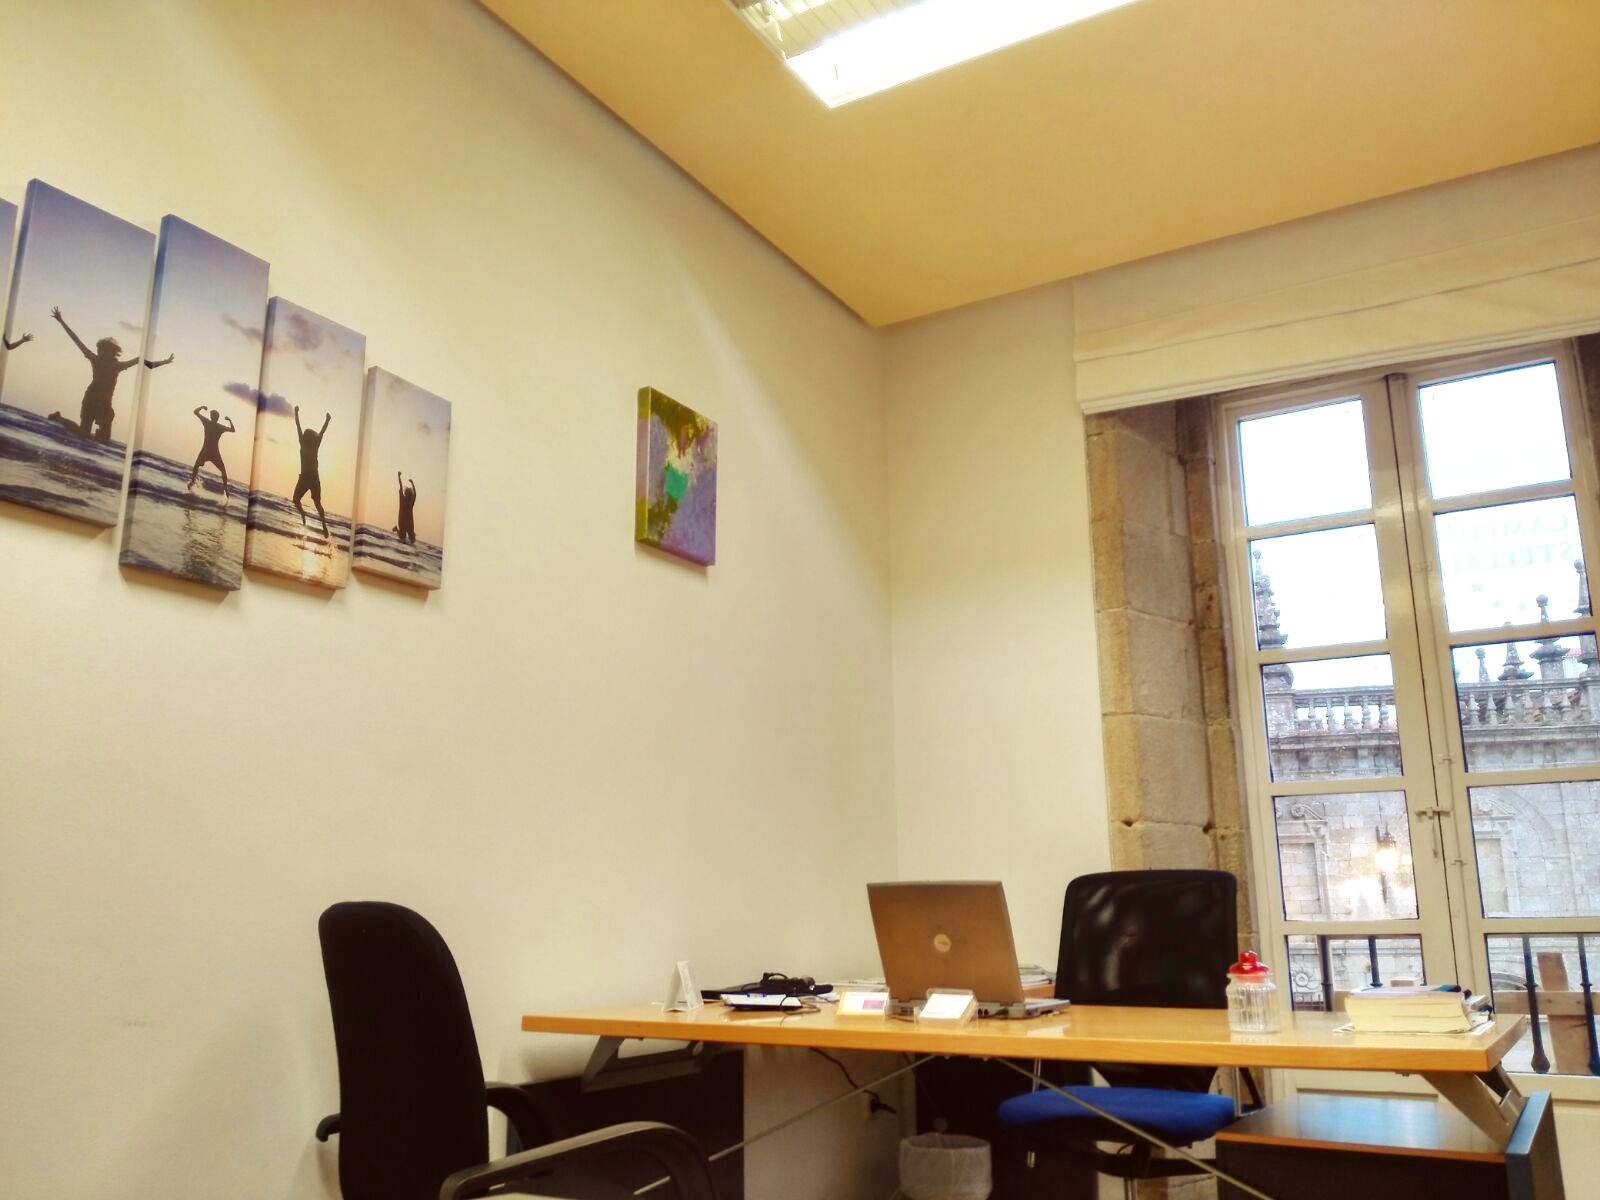 Tu oficina o despacho en santiago de compostela plaza de for Oficina correos santiago de compostela